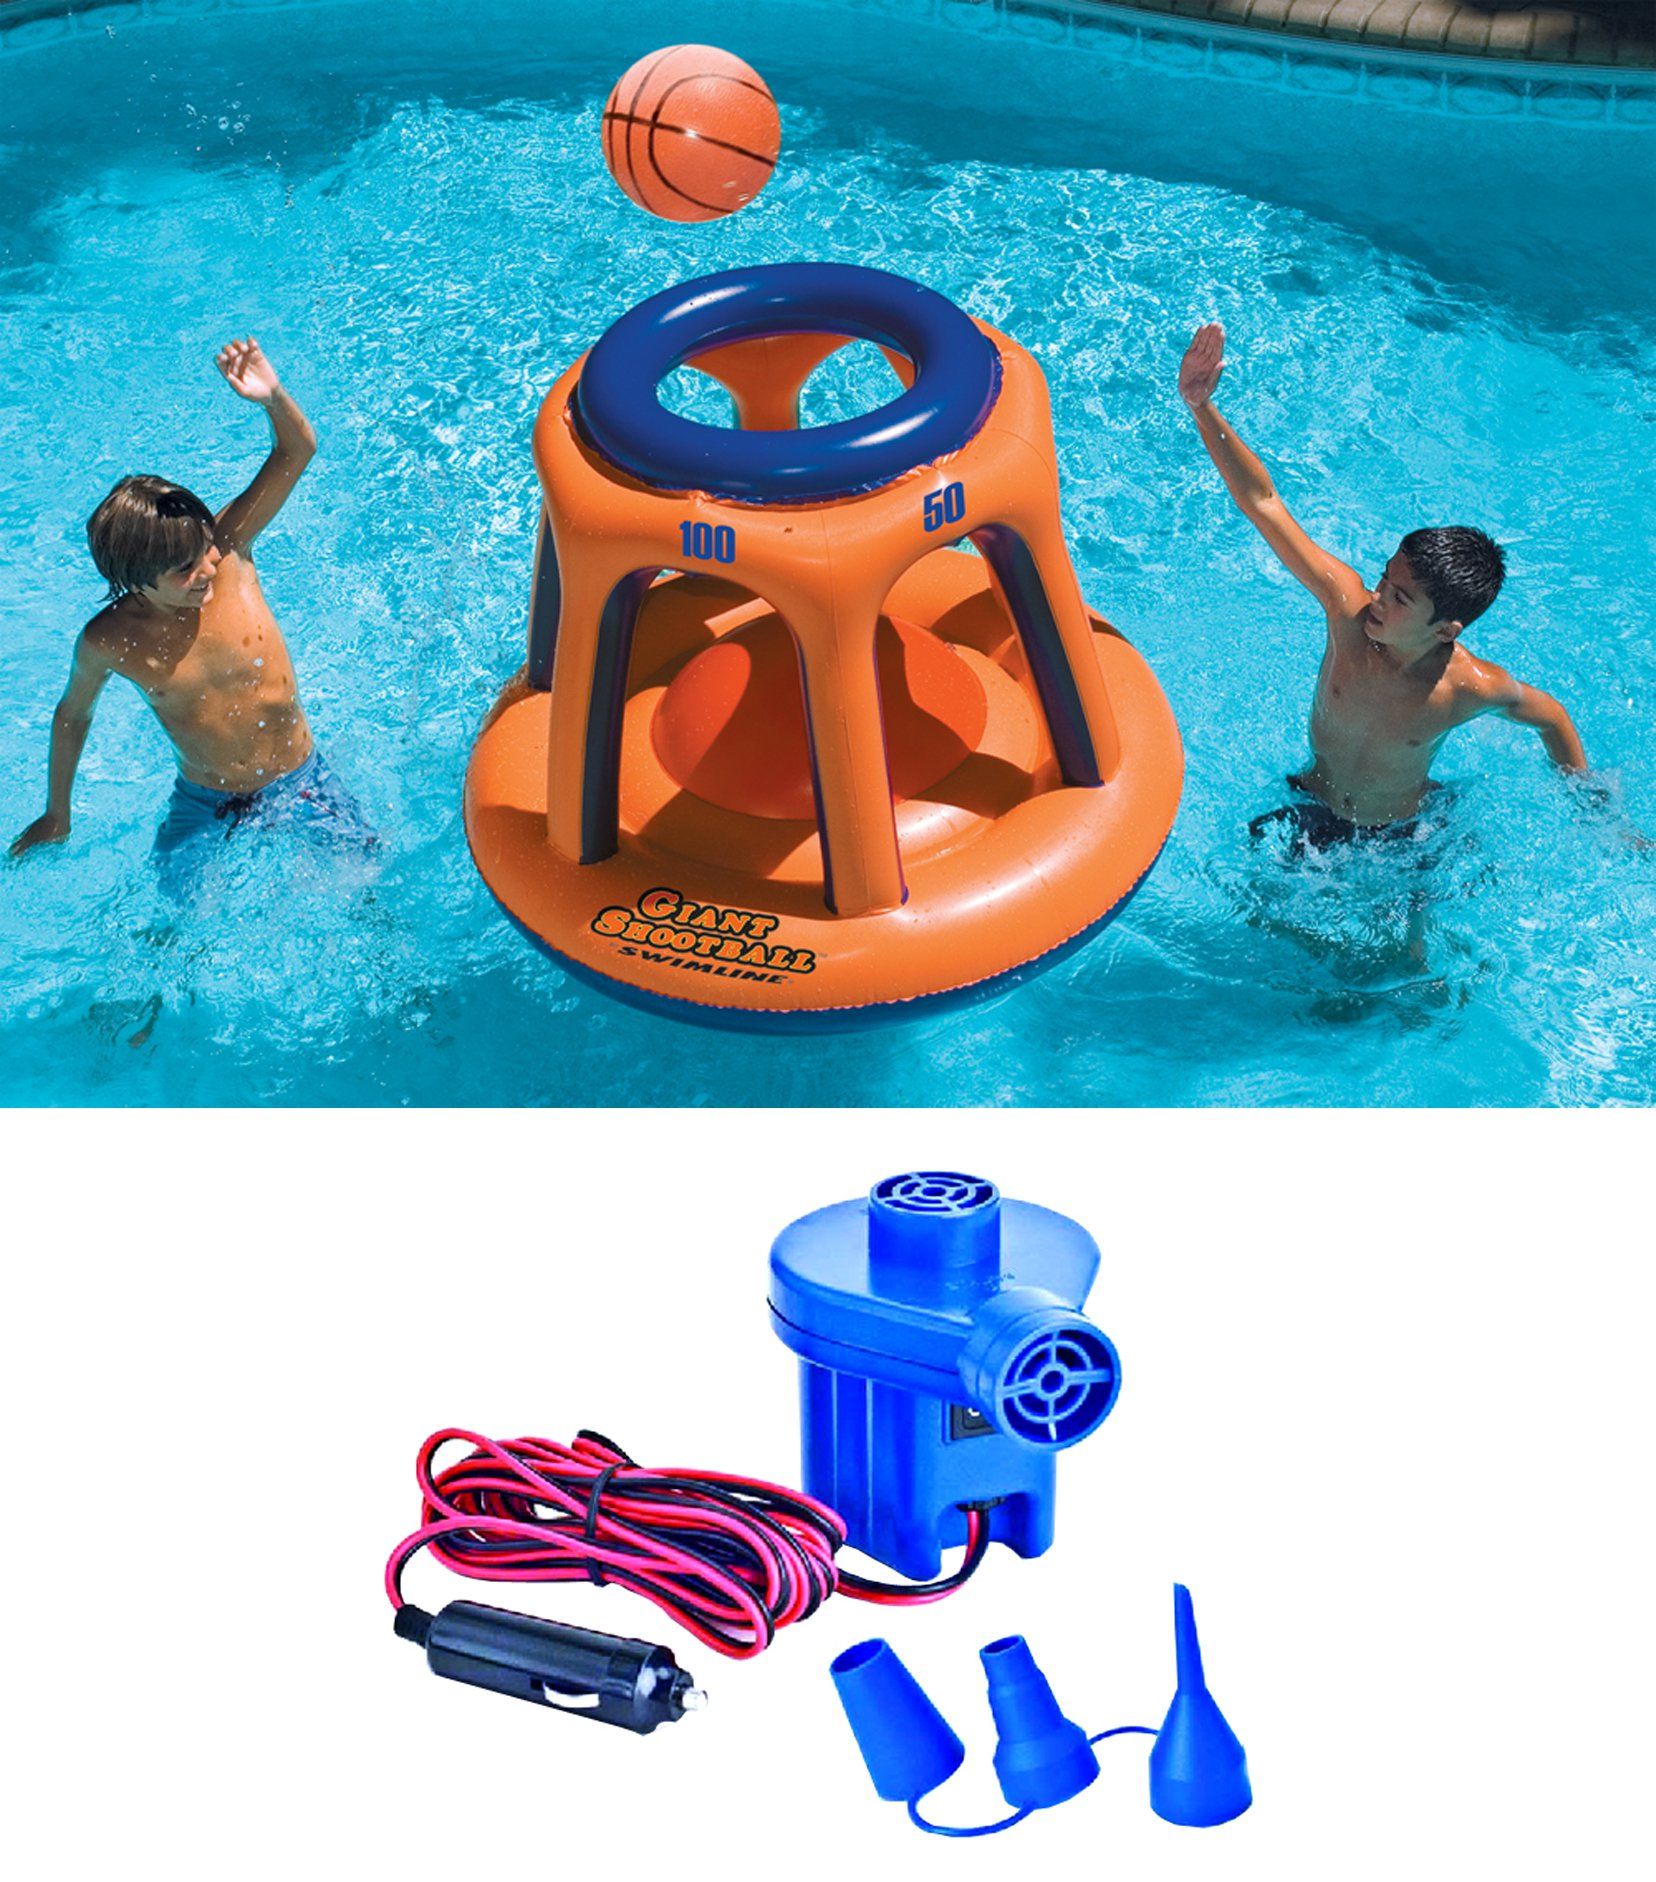 Swimline 90285 Basketball Hoop Shootball Inflatable Pool Toy + Electric Air Pump by Swimline